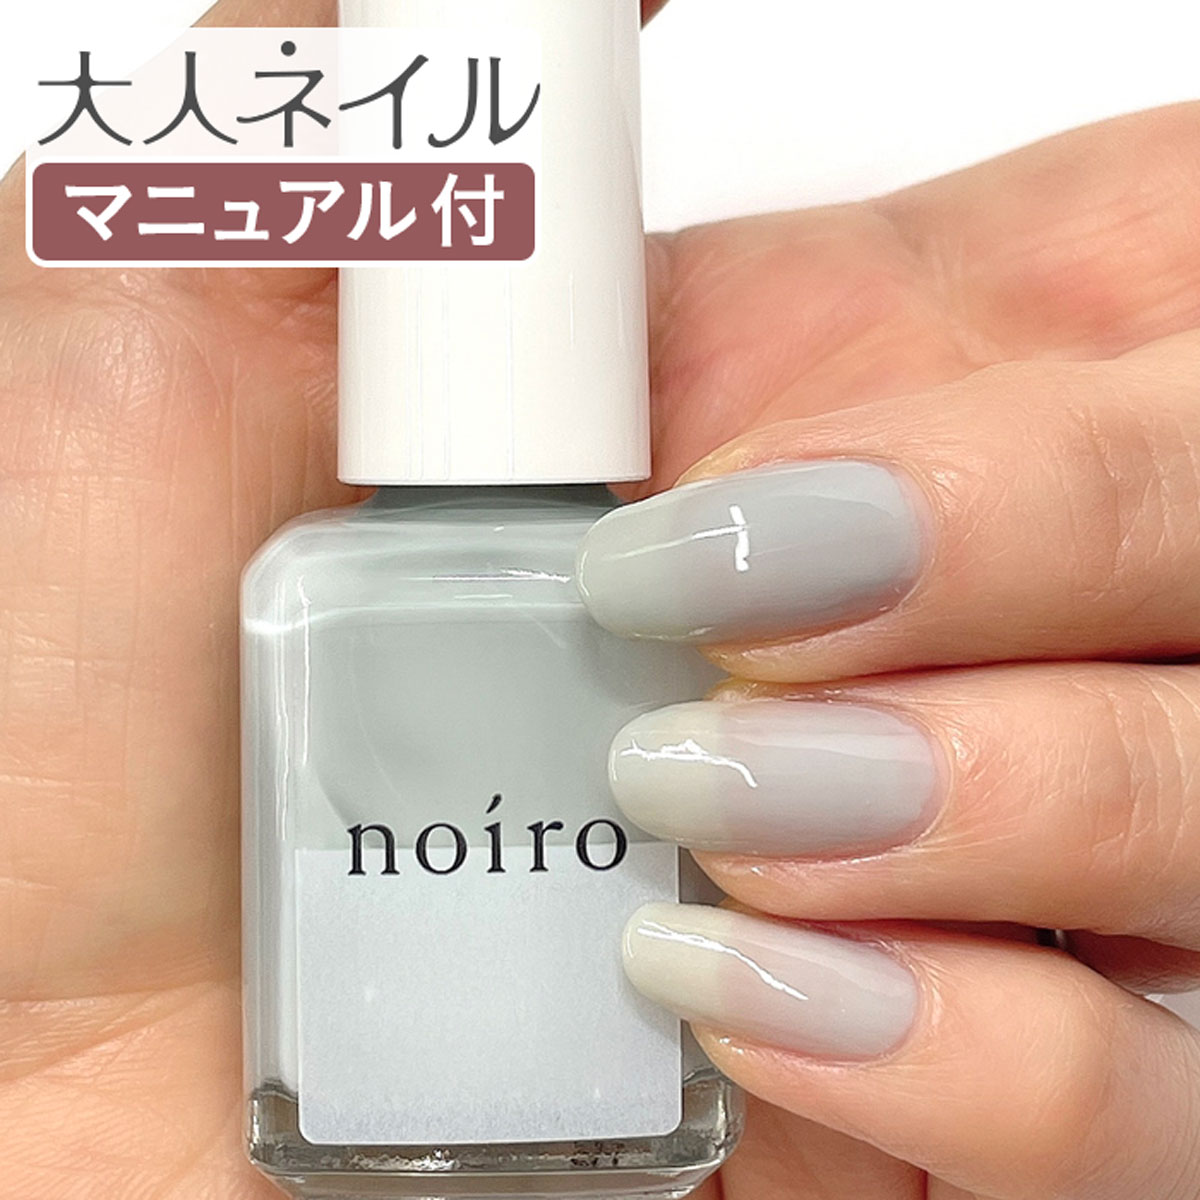 noiro ノイロ ネイルカラー S024 amaoto 11ml 爪に やさしい マニキュア セルフネイル シアー ライトグレー 春ネイル